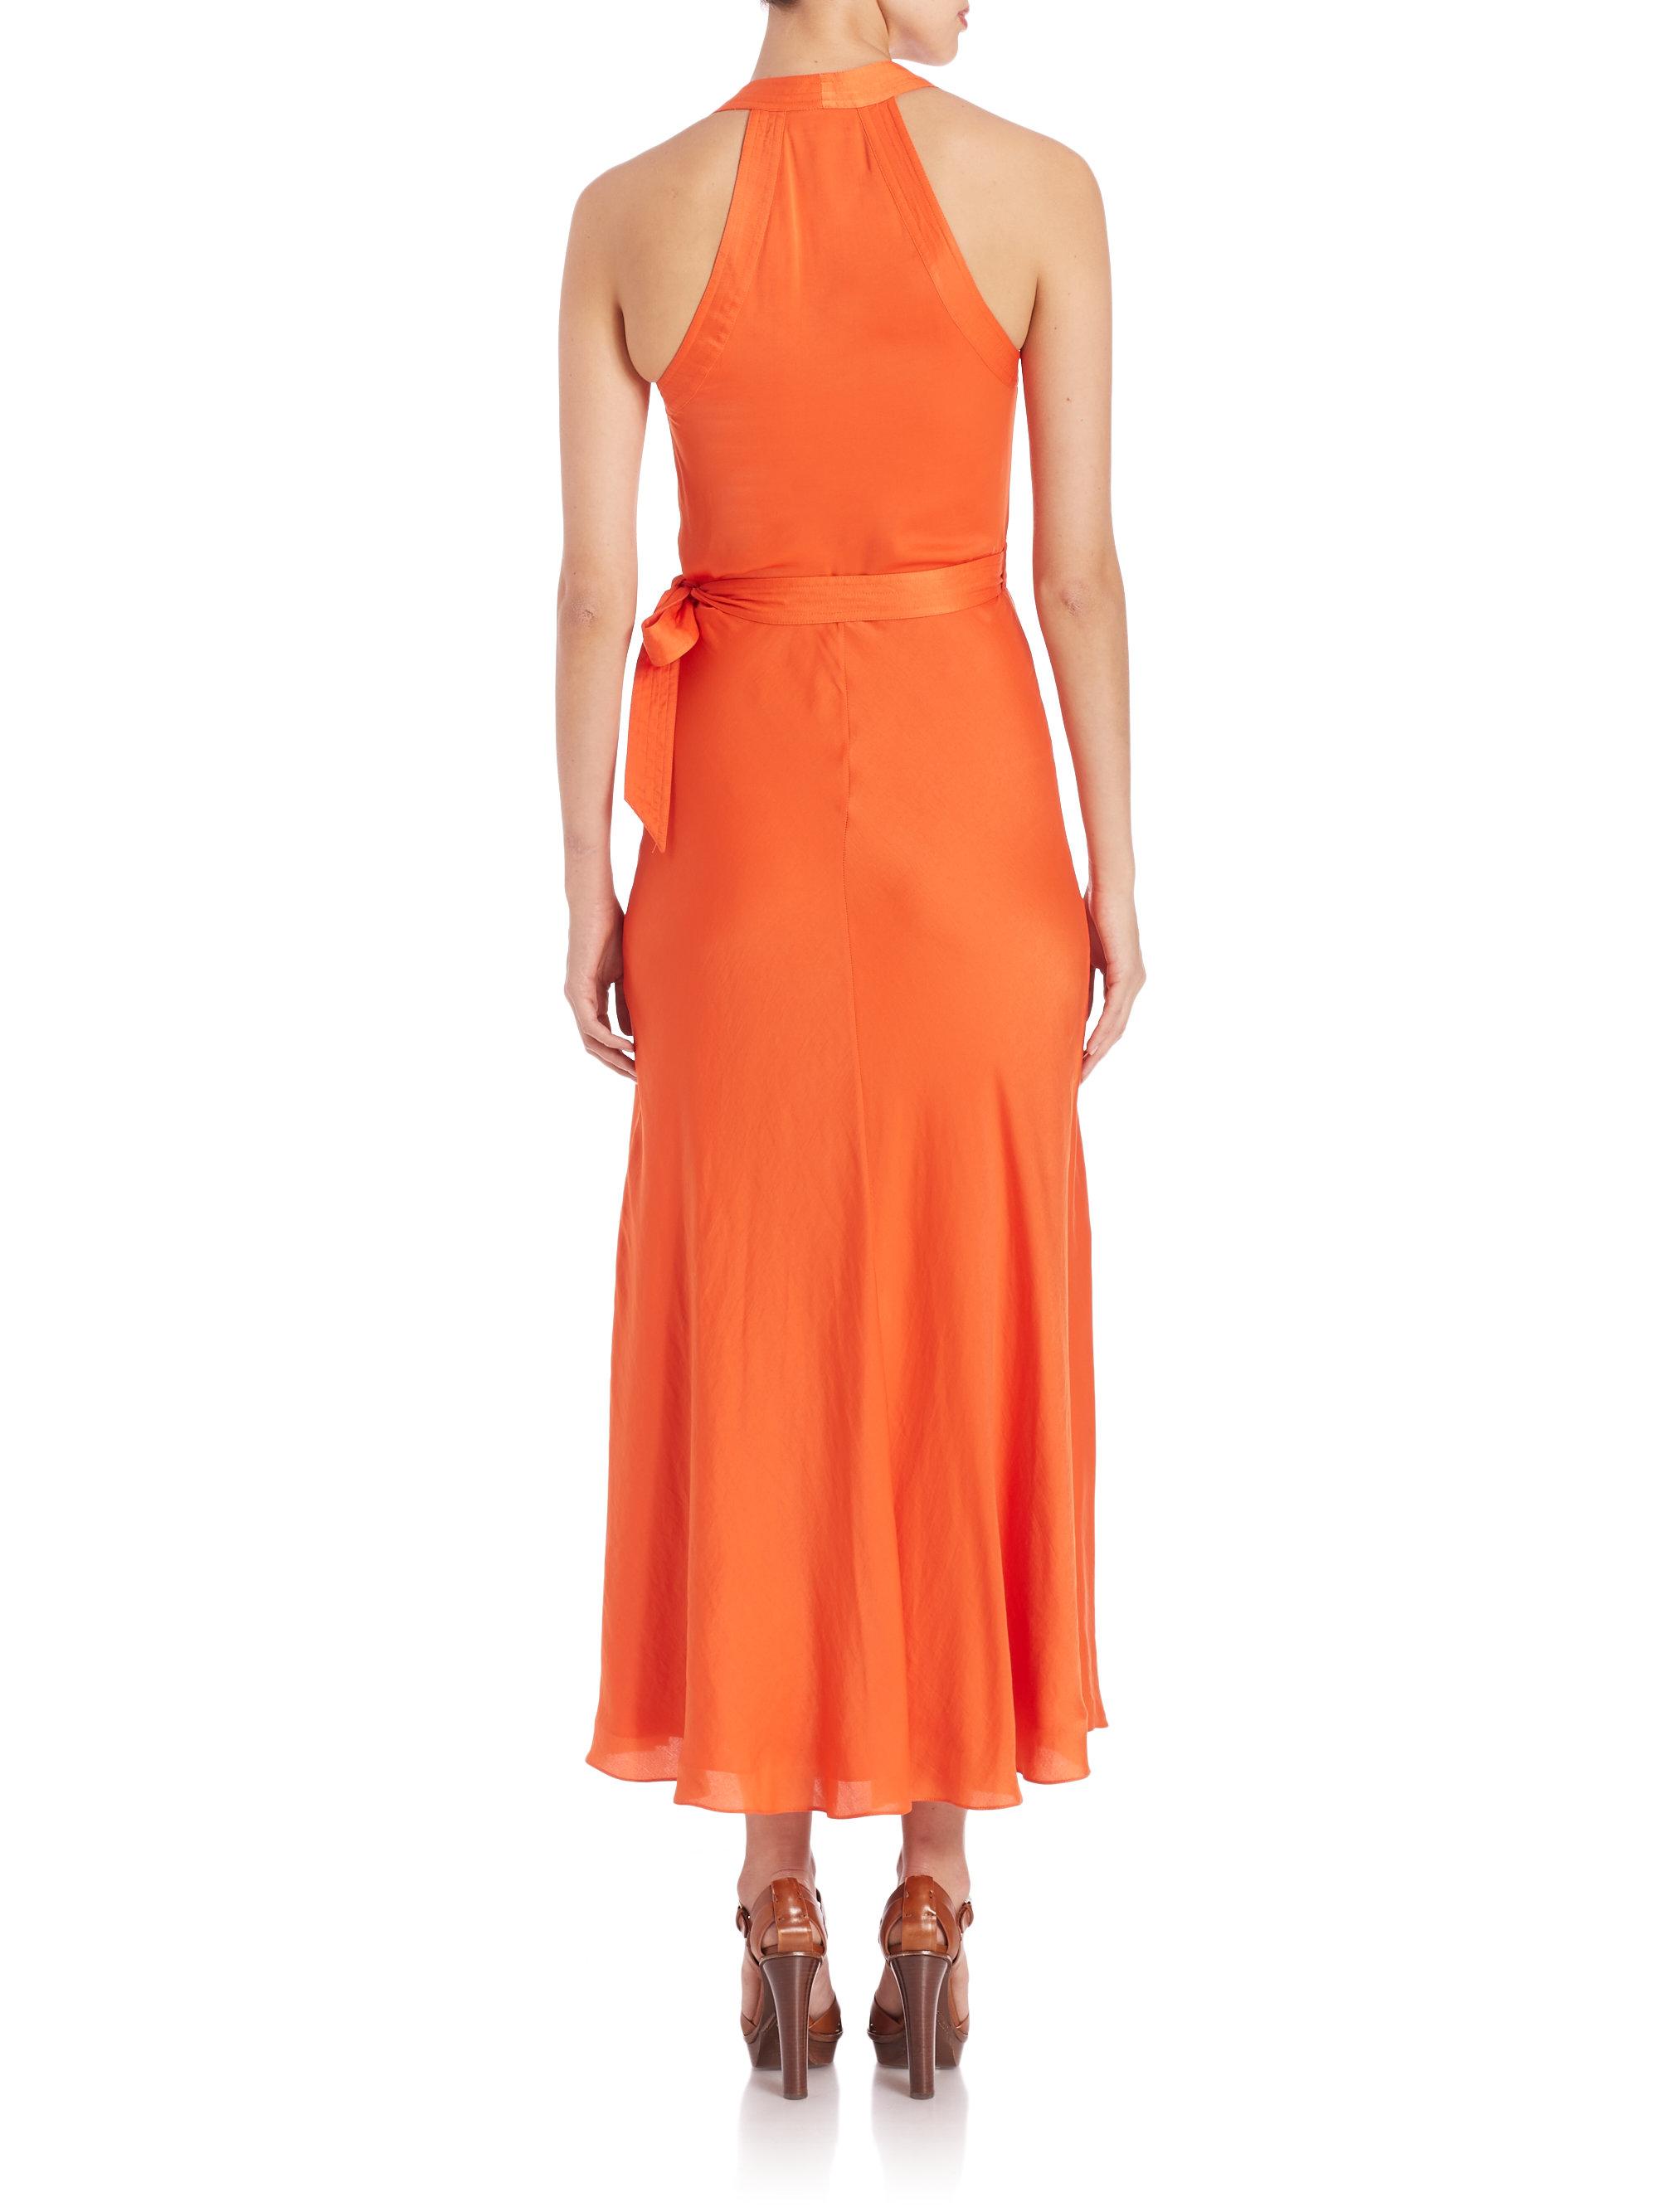 Lyst Polo Ralph Lauren Satin Wrap Dress In Orange